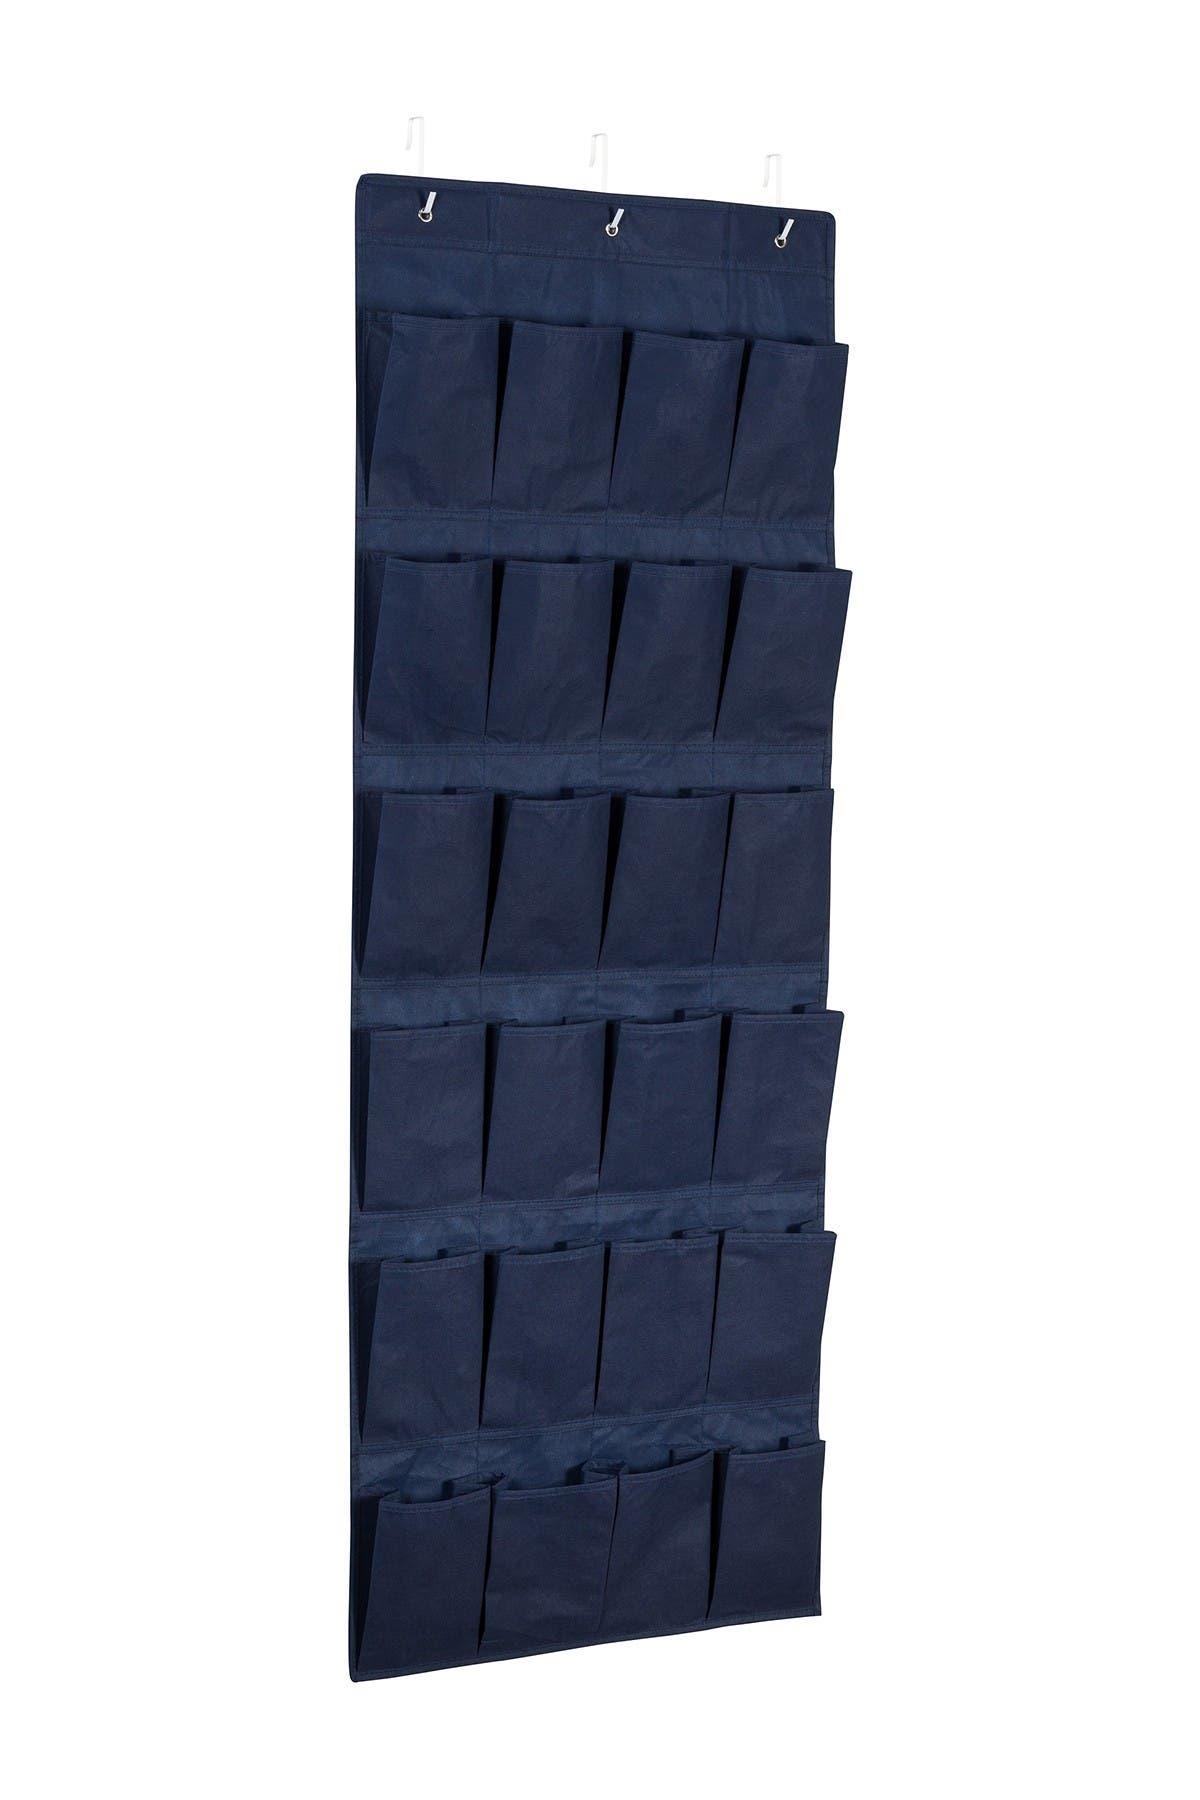 Image of Honey-Can-Do Navy 24-Pocket Over the Door Shoe Organizer